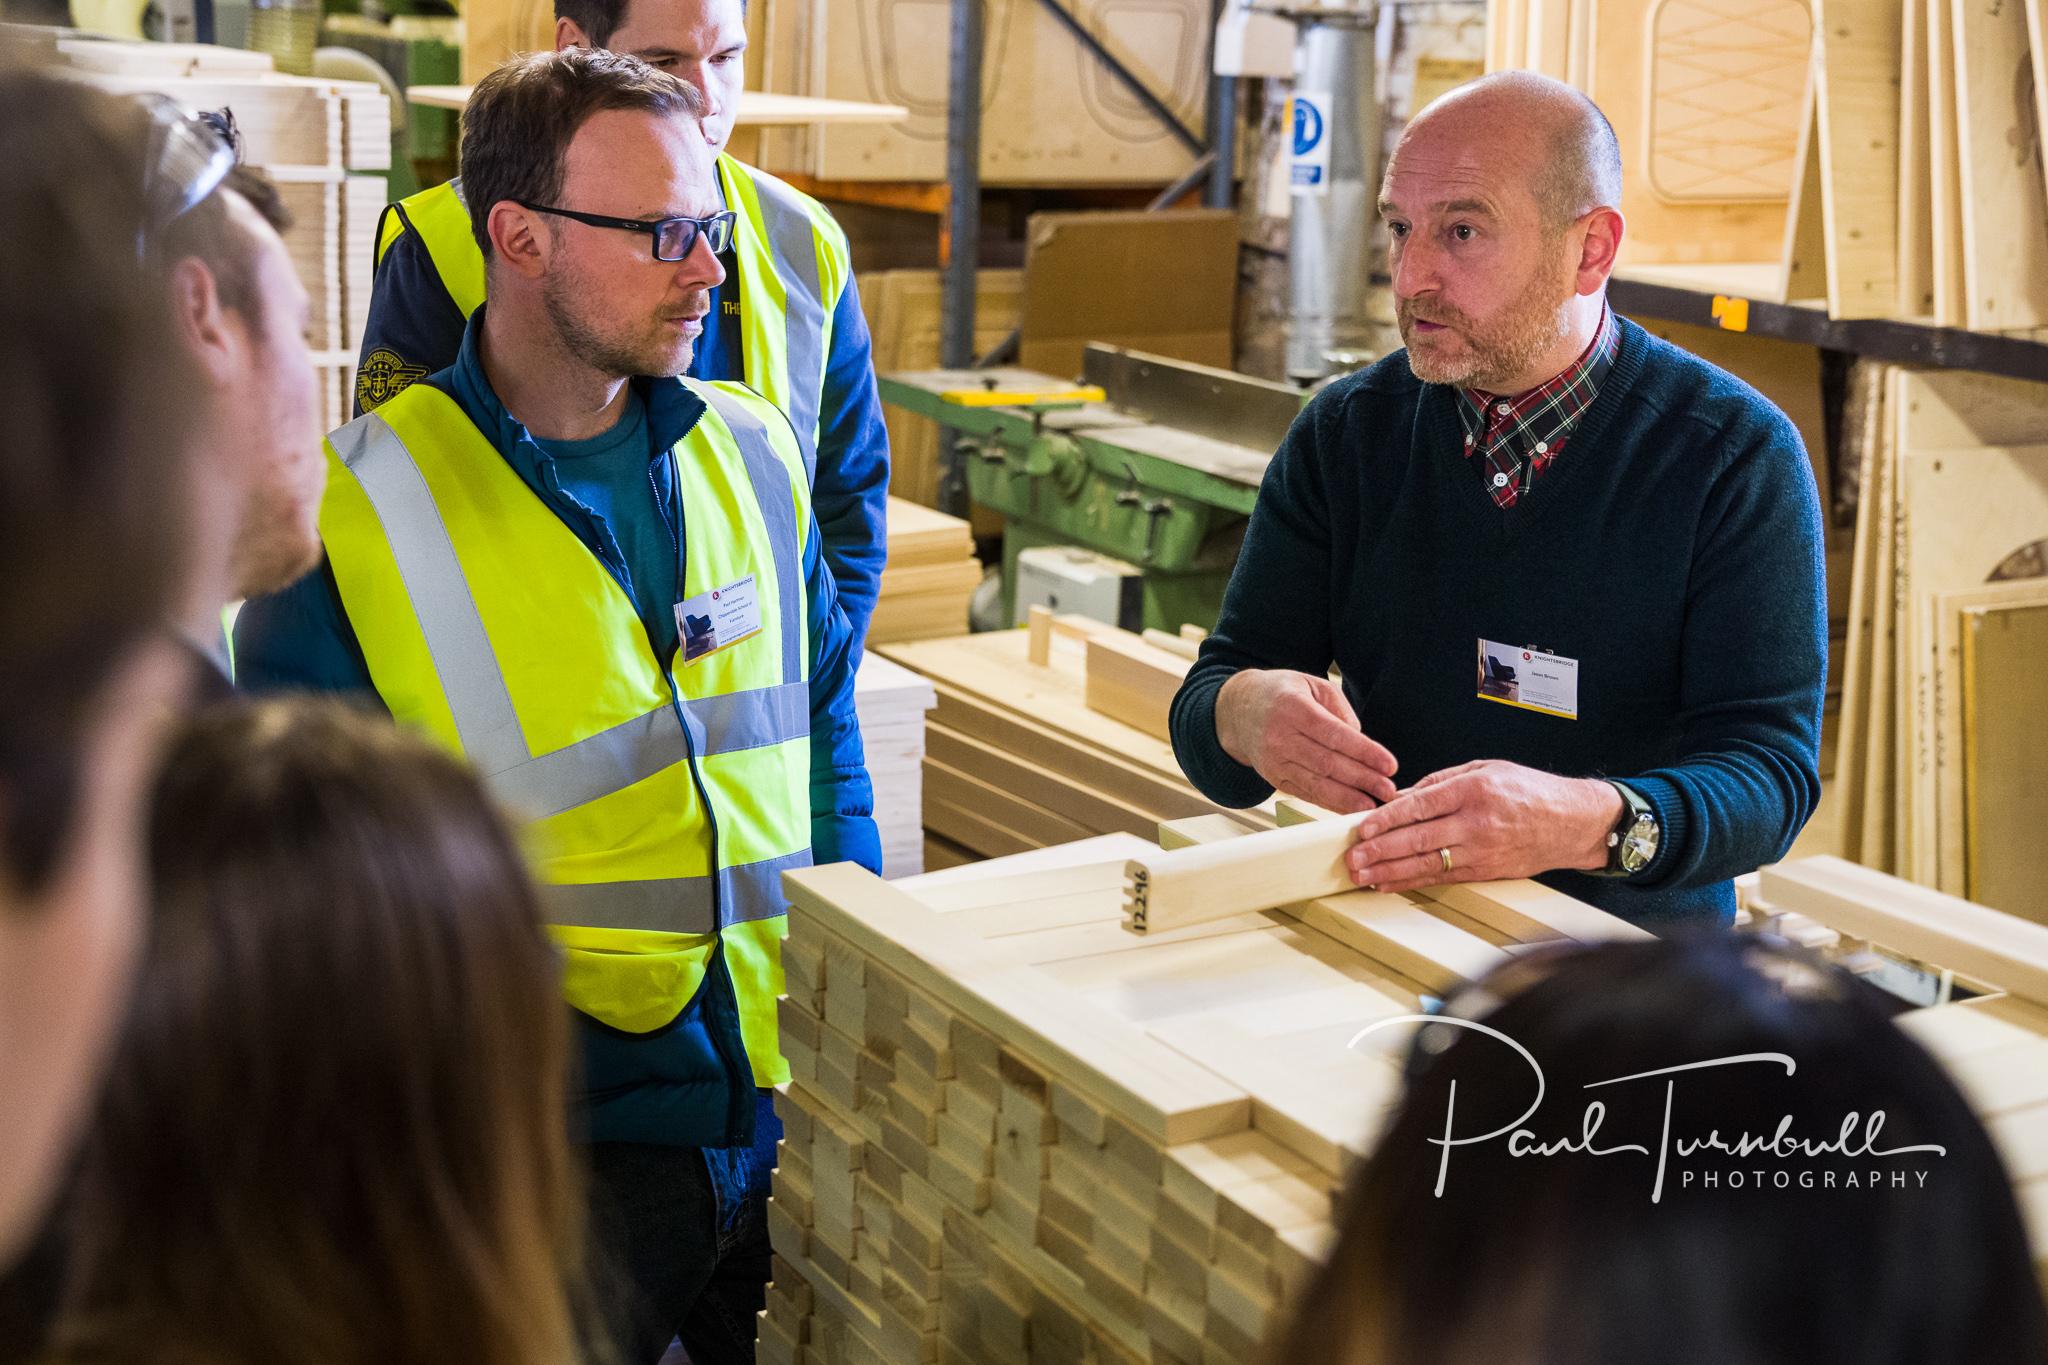 commercial-photographer-leeds-bradford-knightsbridge-furniture-tour-011.jpg